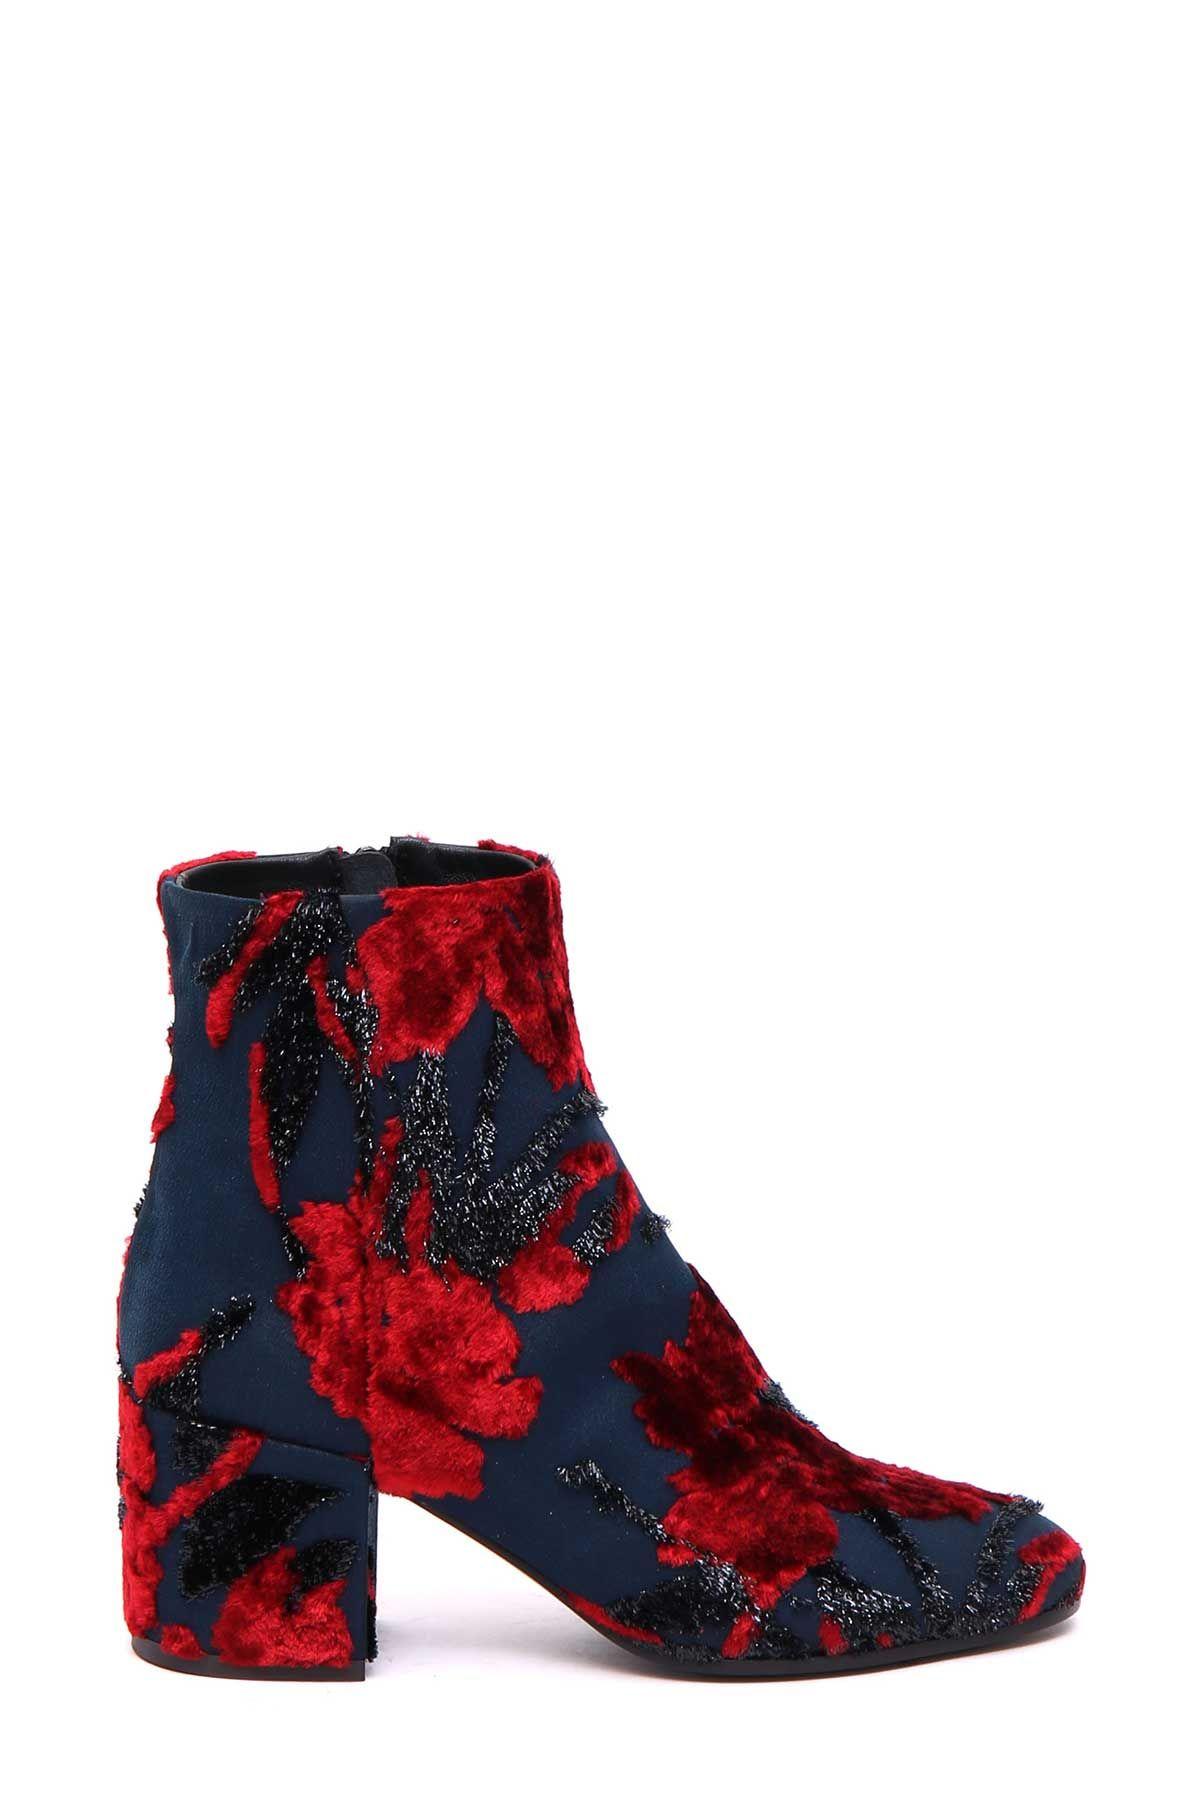 Parosh Parosh Block Heel Ankle Boots